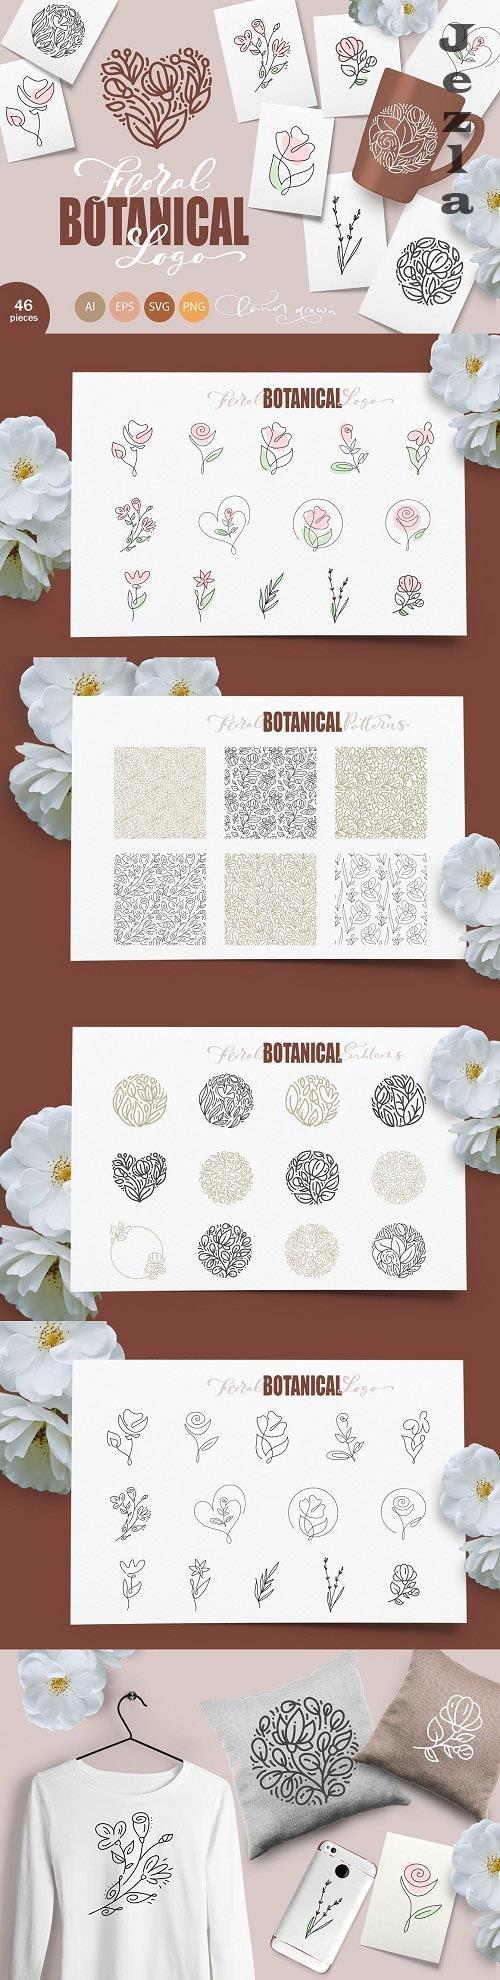 Floral Botanical Logo - 6255562